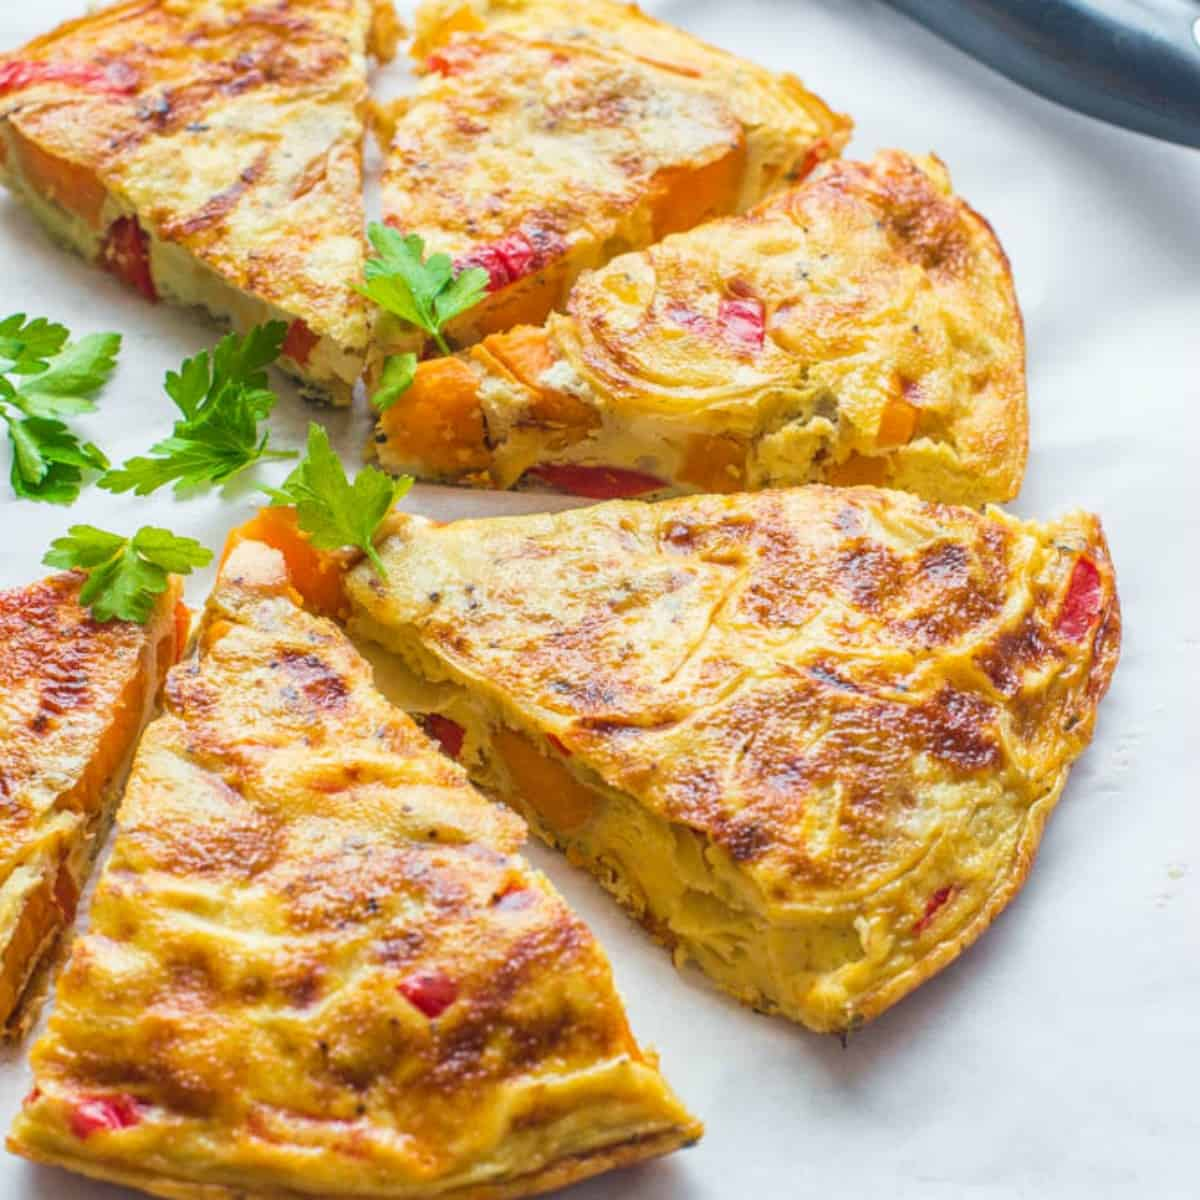 Sweet Potato Omelette (Gluten Free + Paleo)